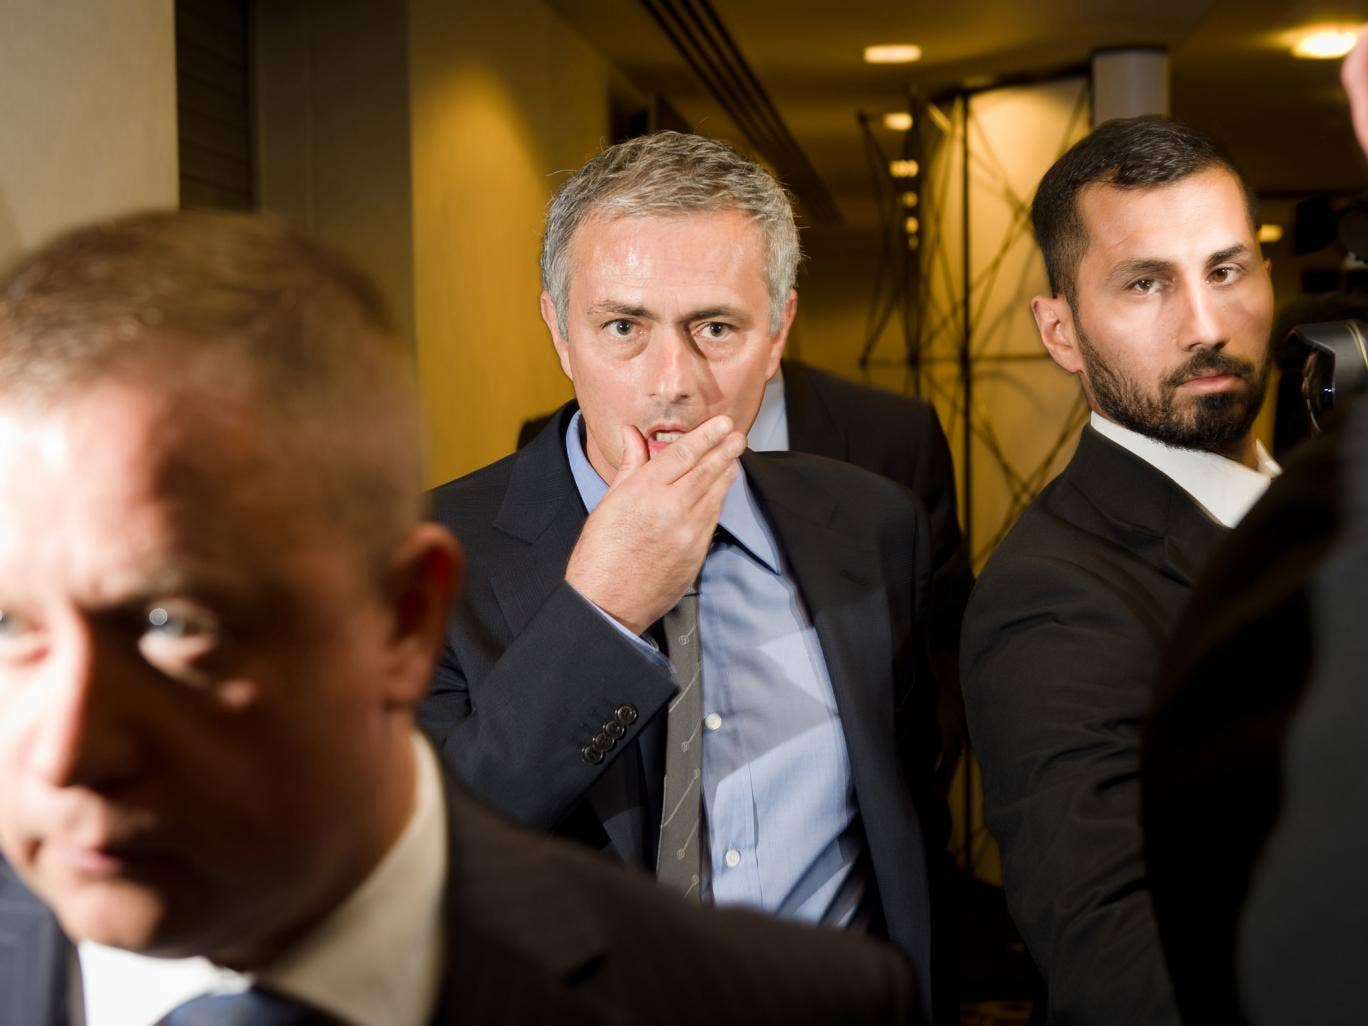 Jose Mourinho leaves after addressing the press